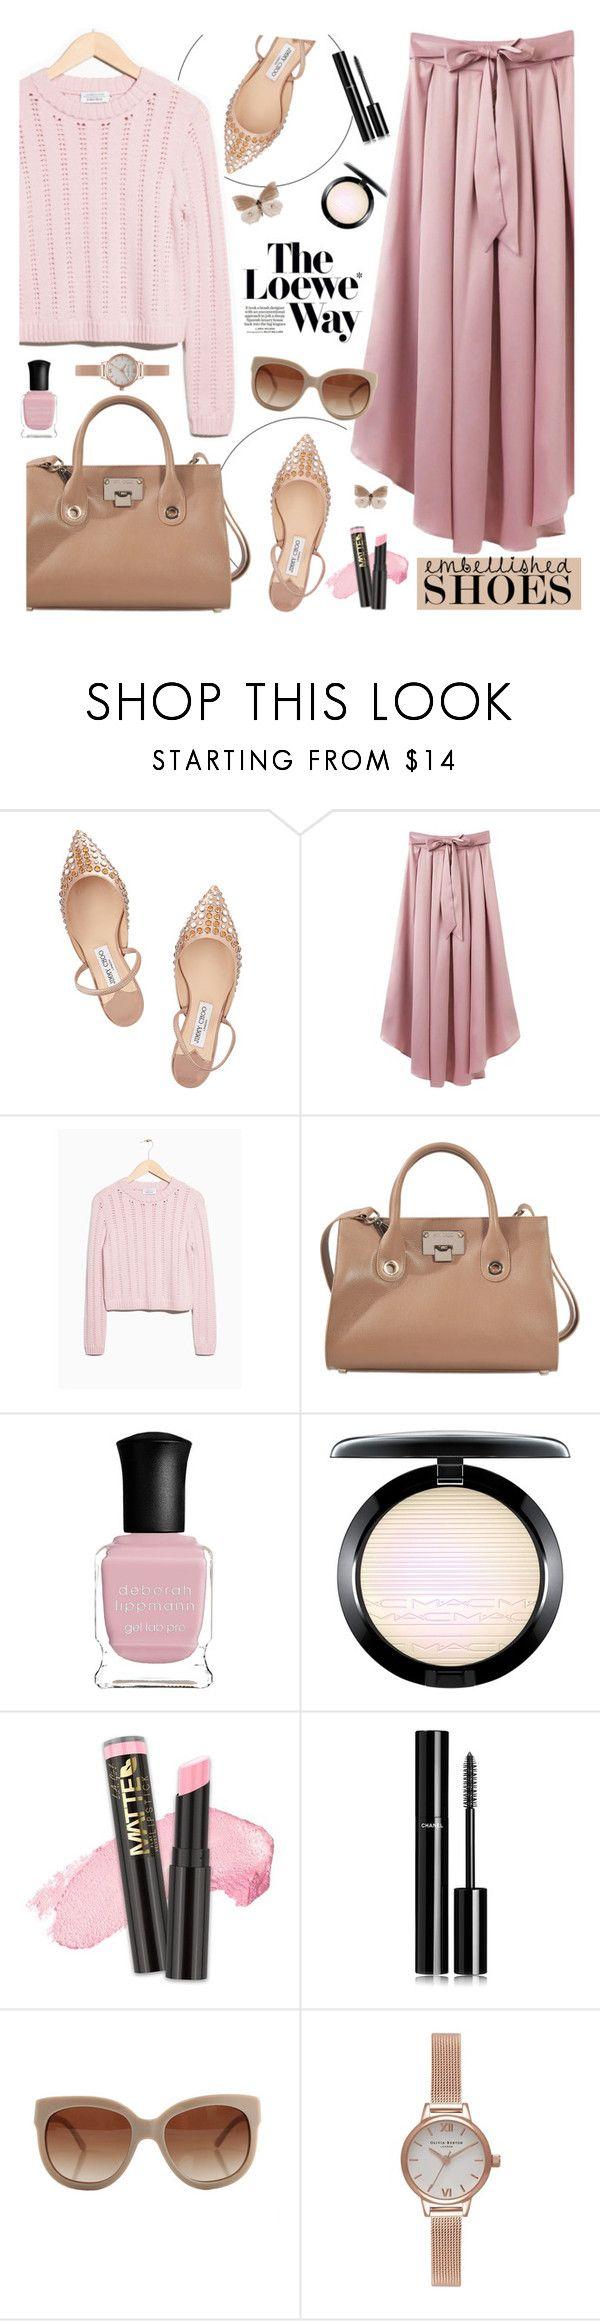 """Embellished Shoes"" by tamara-p ❤ liked on Polyvore featuring Jimmy Choo, Loewe, Deborah Lippmann, Chanel, STELLA McCARTNEY and embellishedshoes"